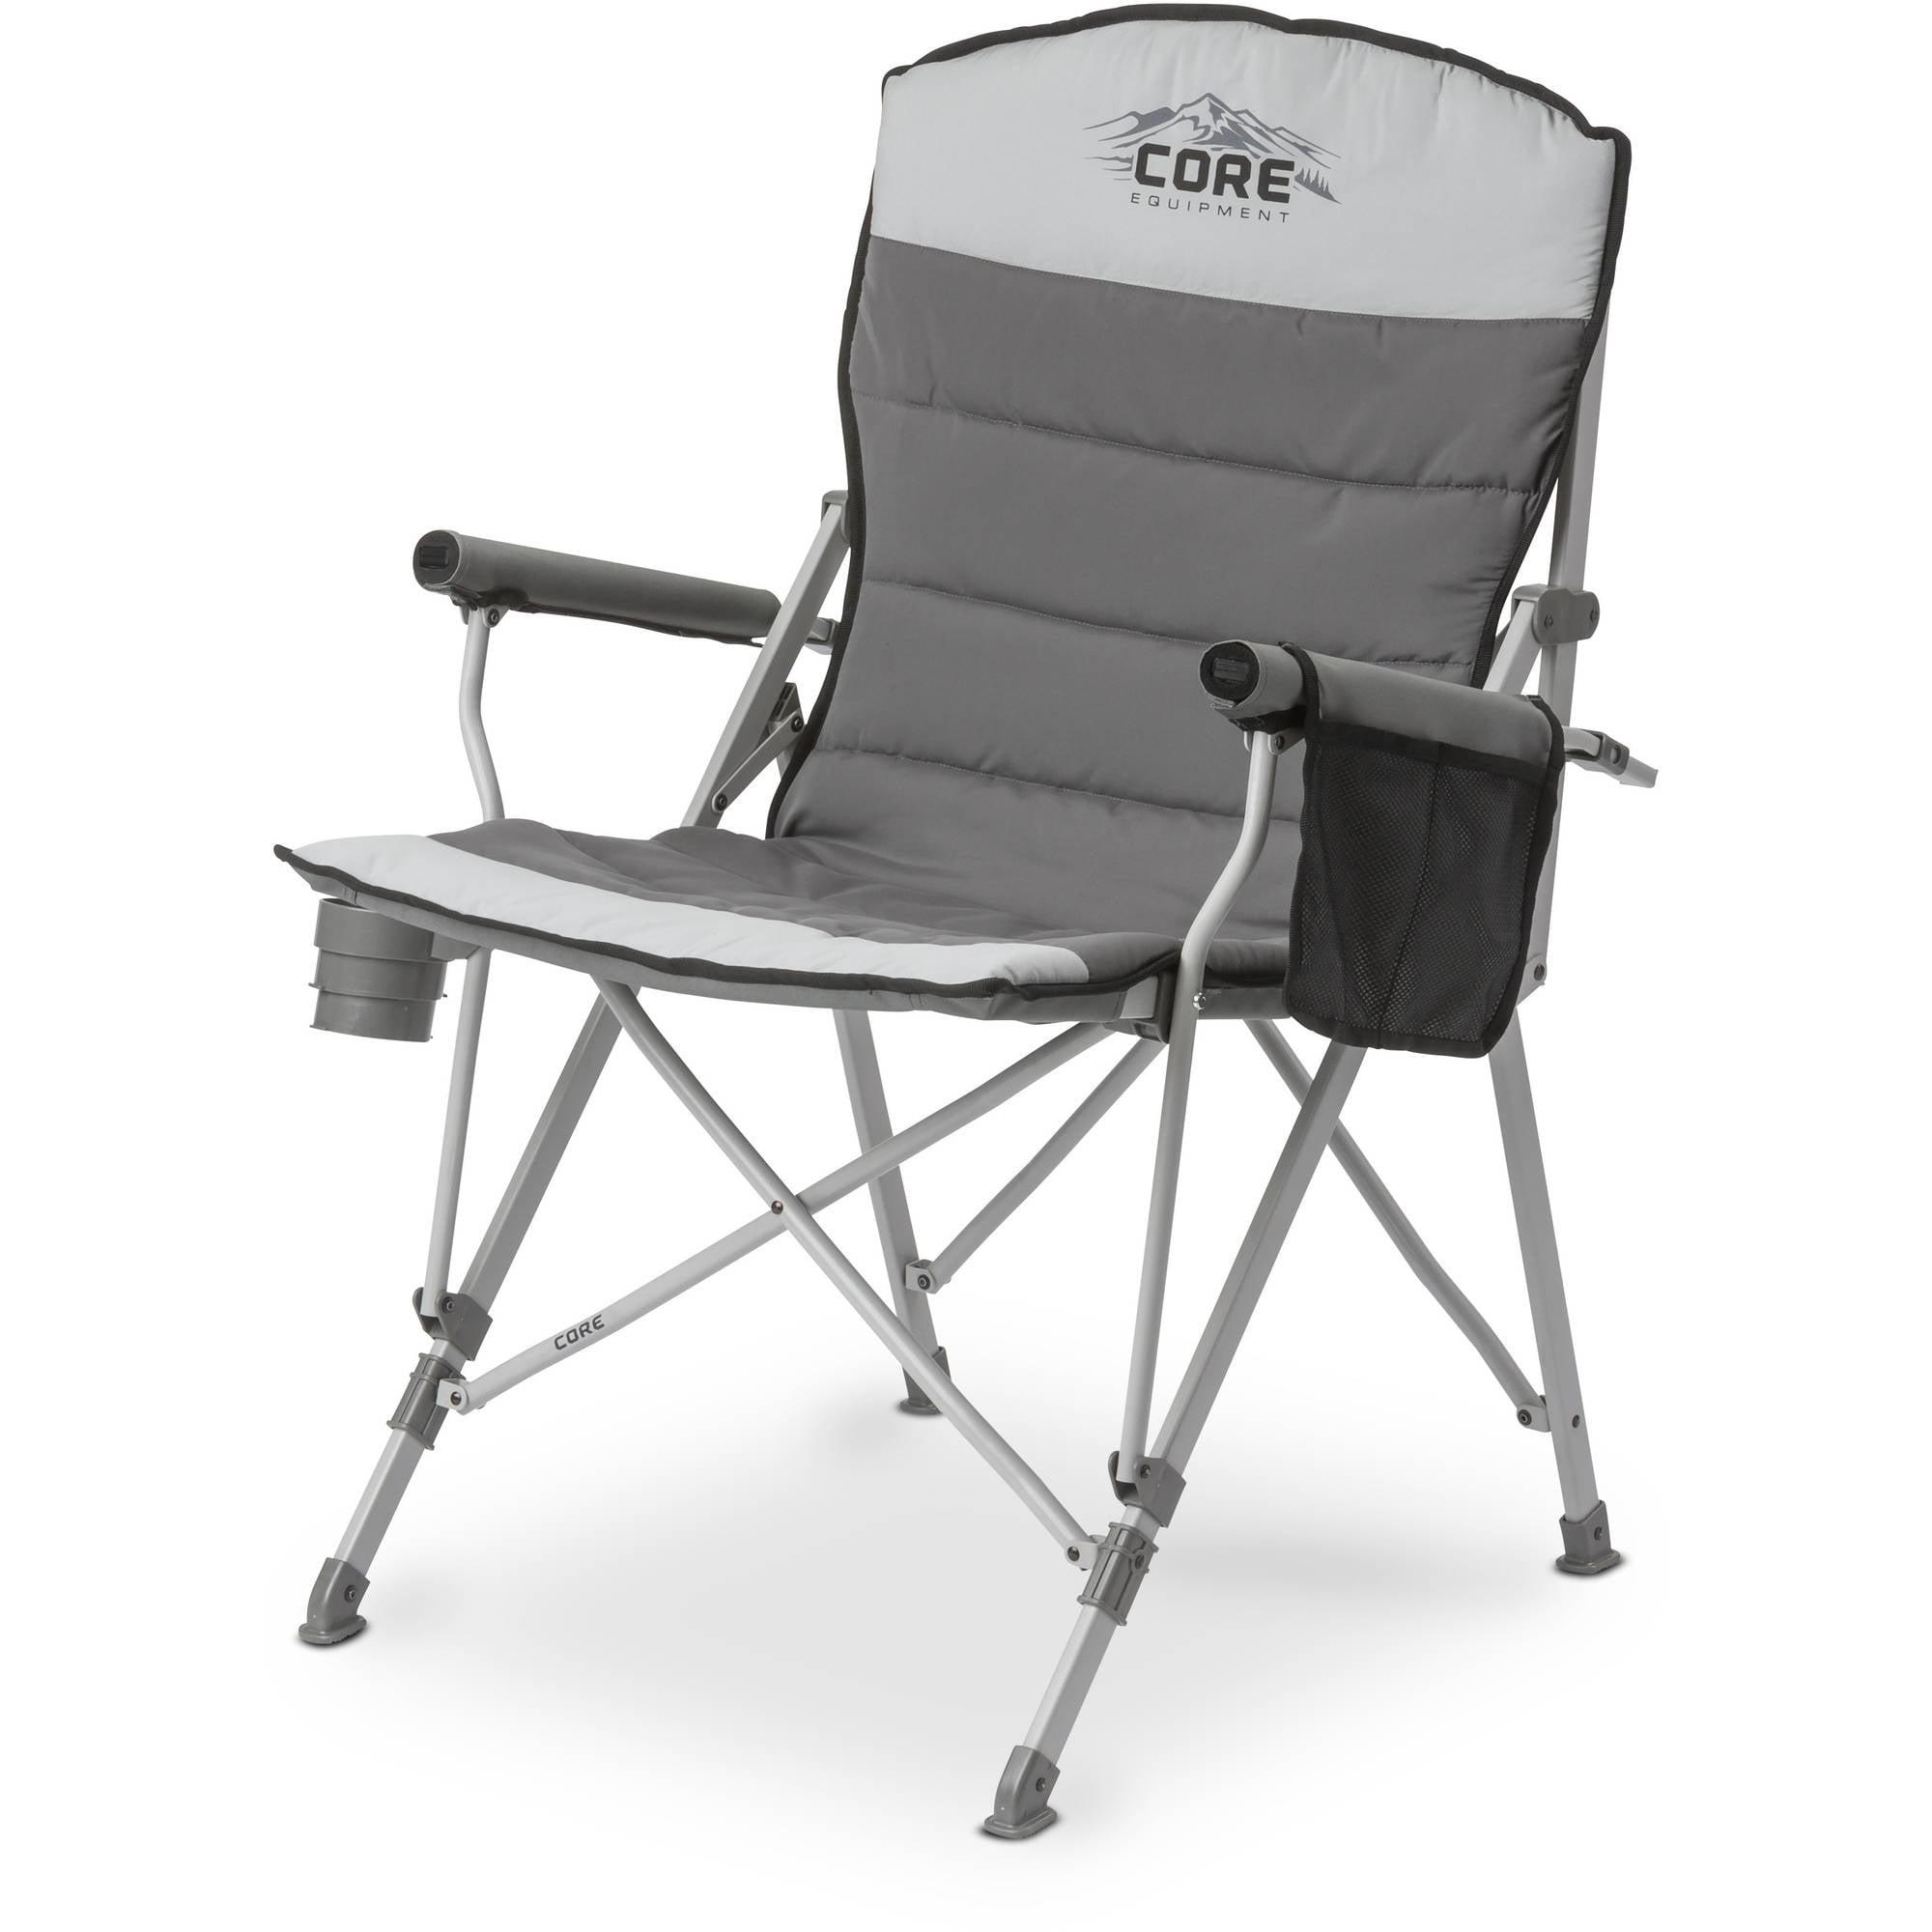 CORE Equipment Padded Hard Arm Chair